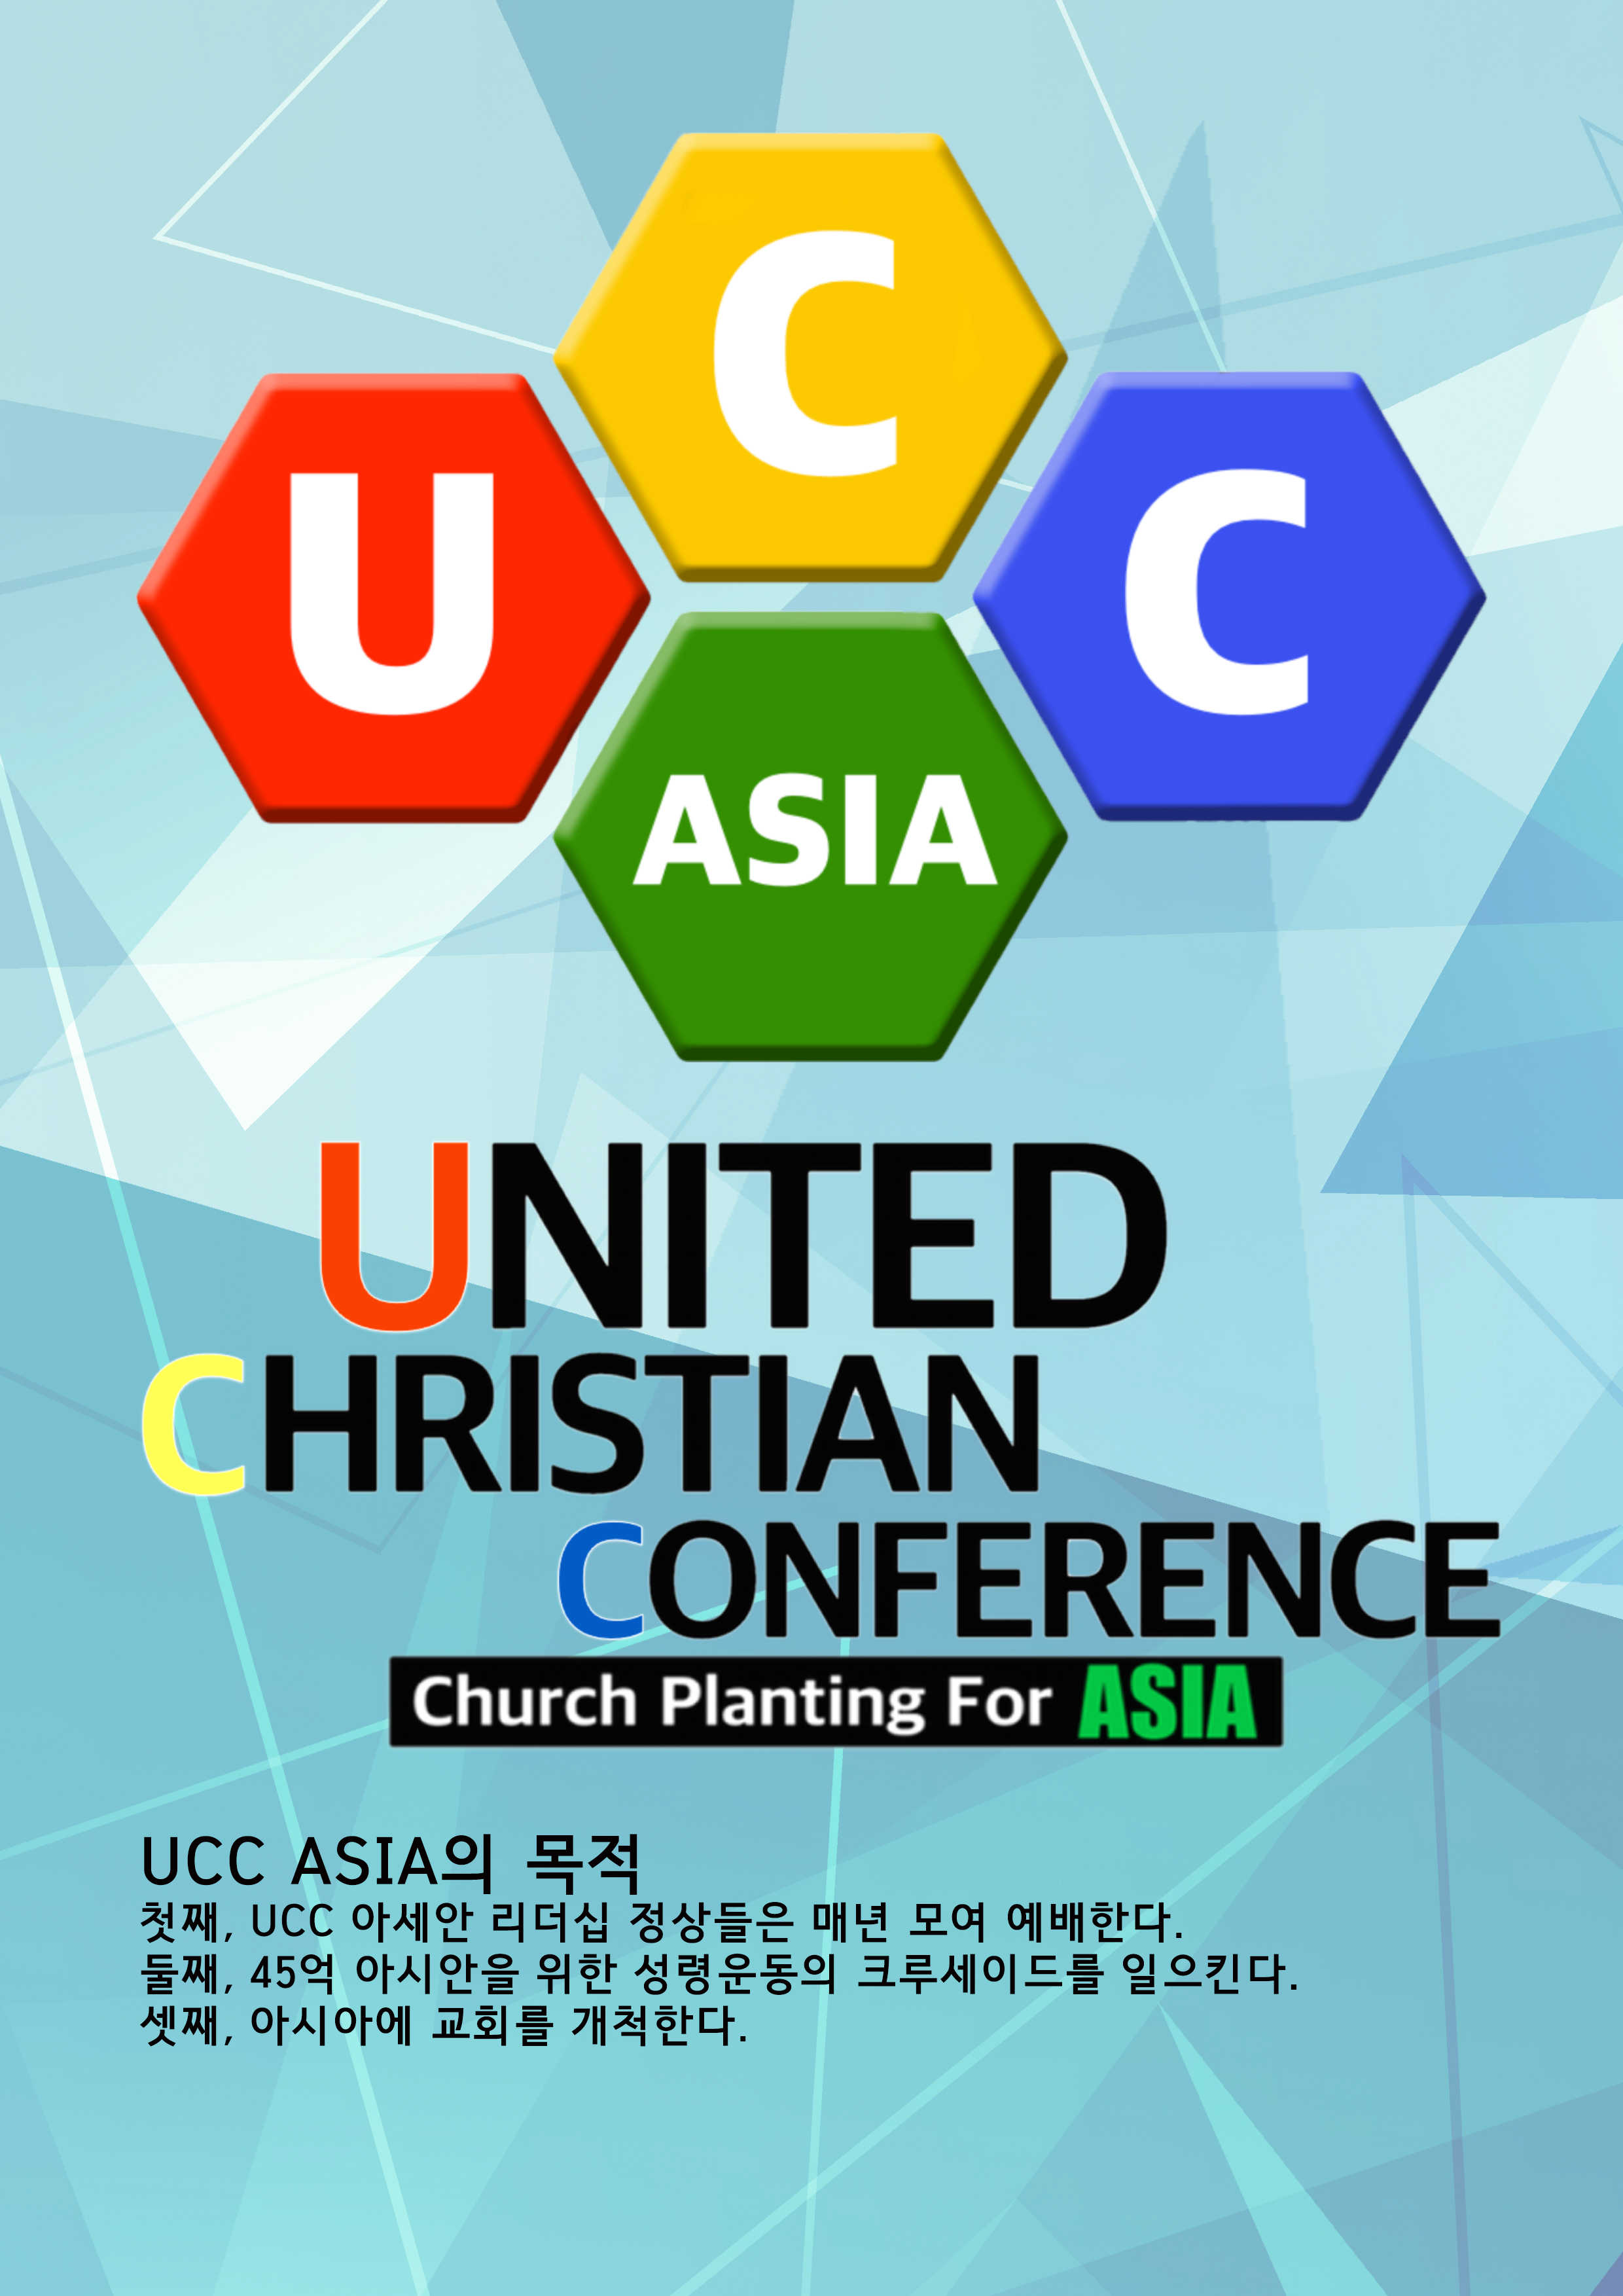 UCC ASIA 홈피 메인 이미지 COPY.jpg